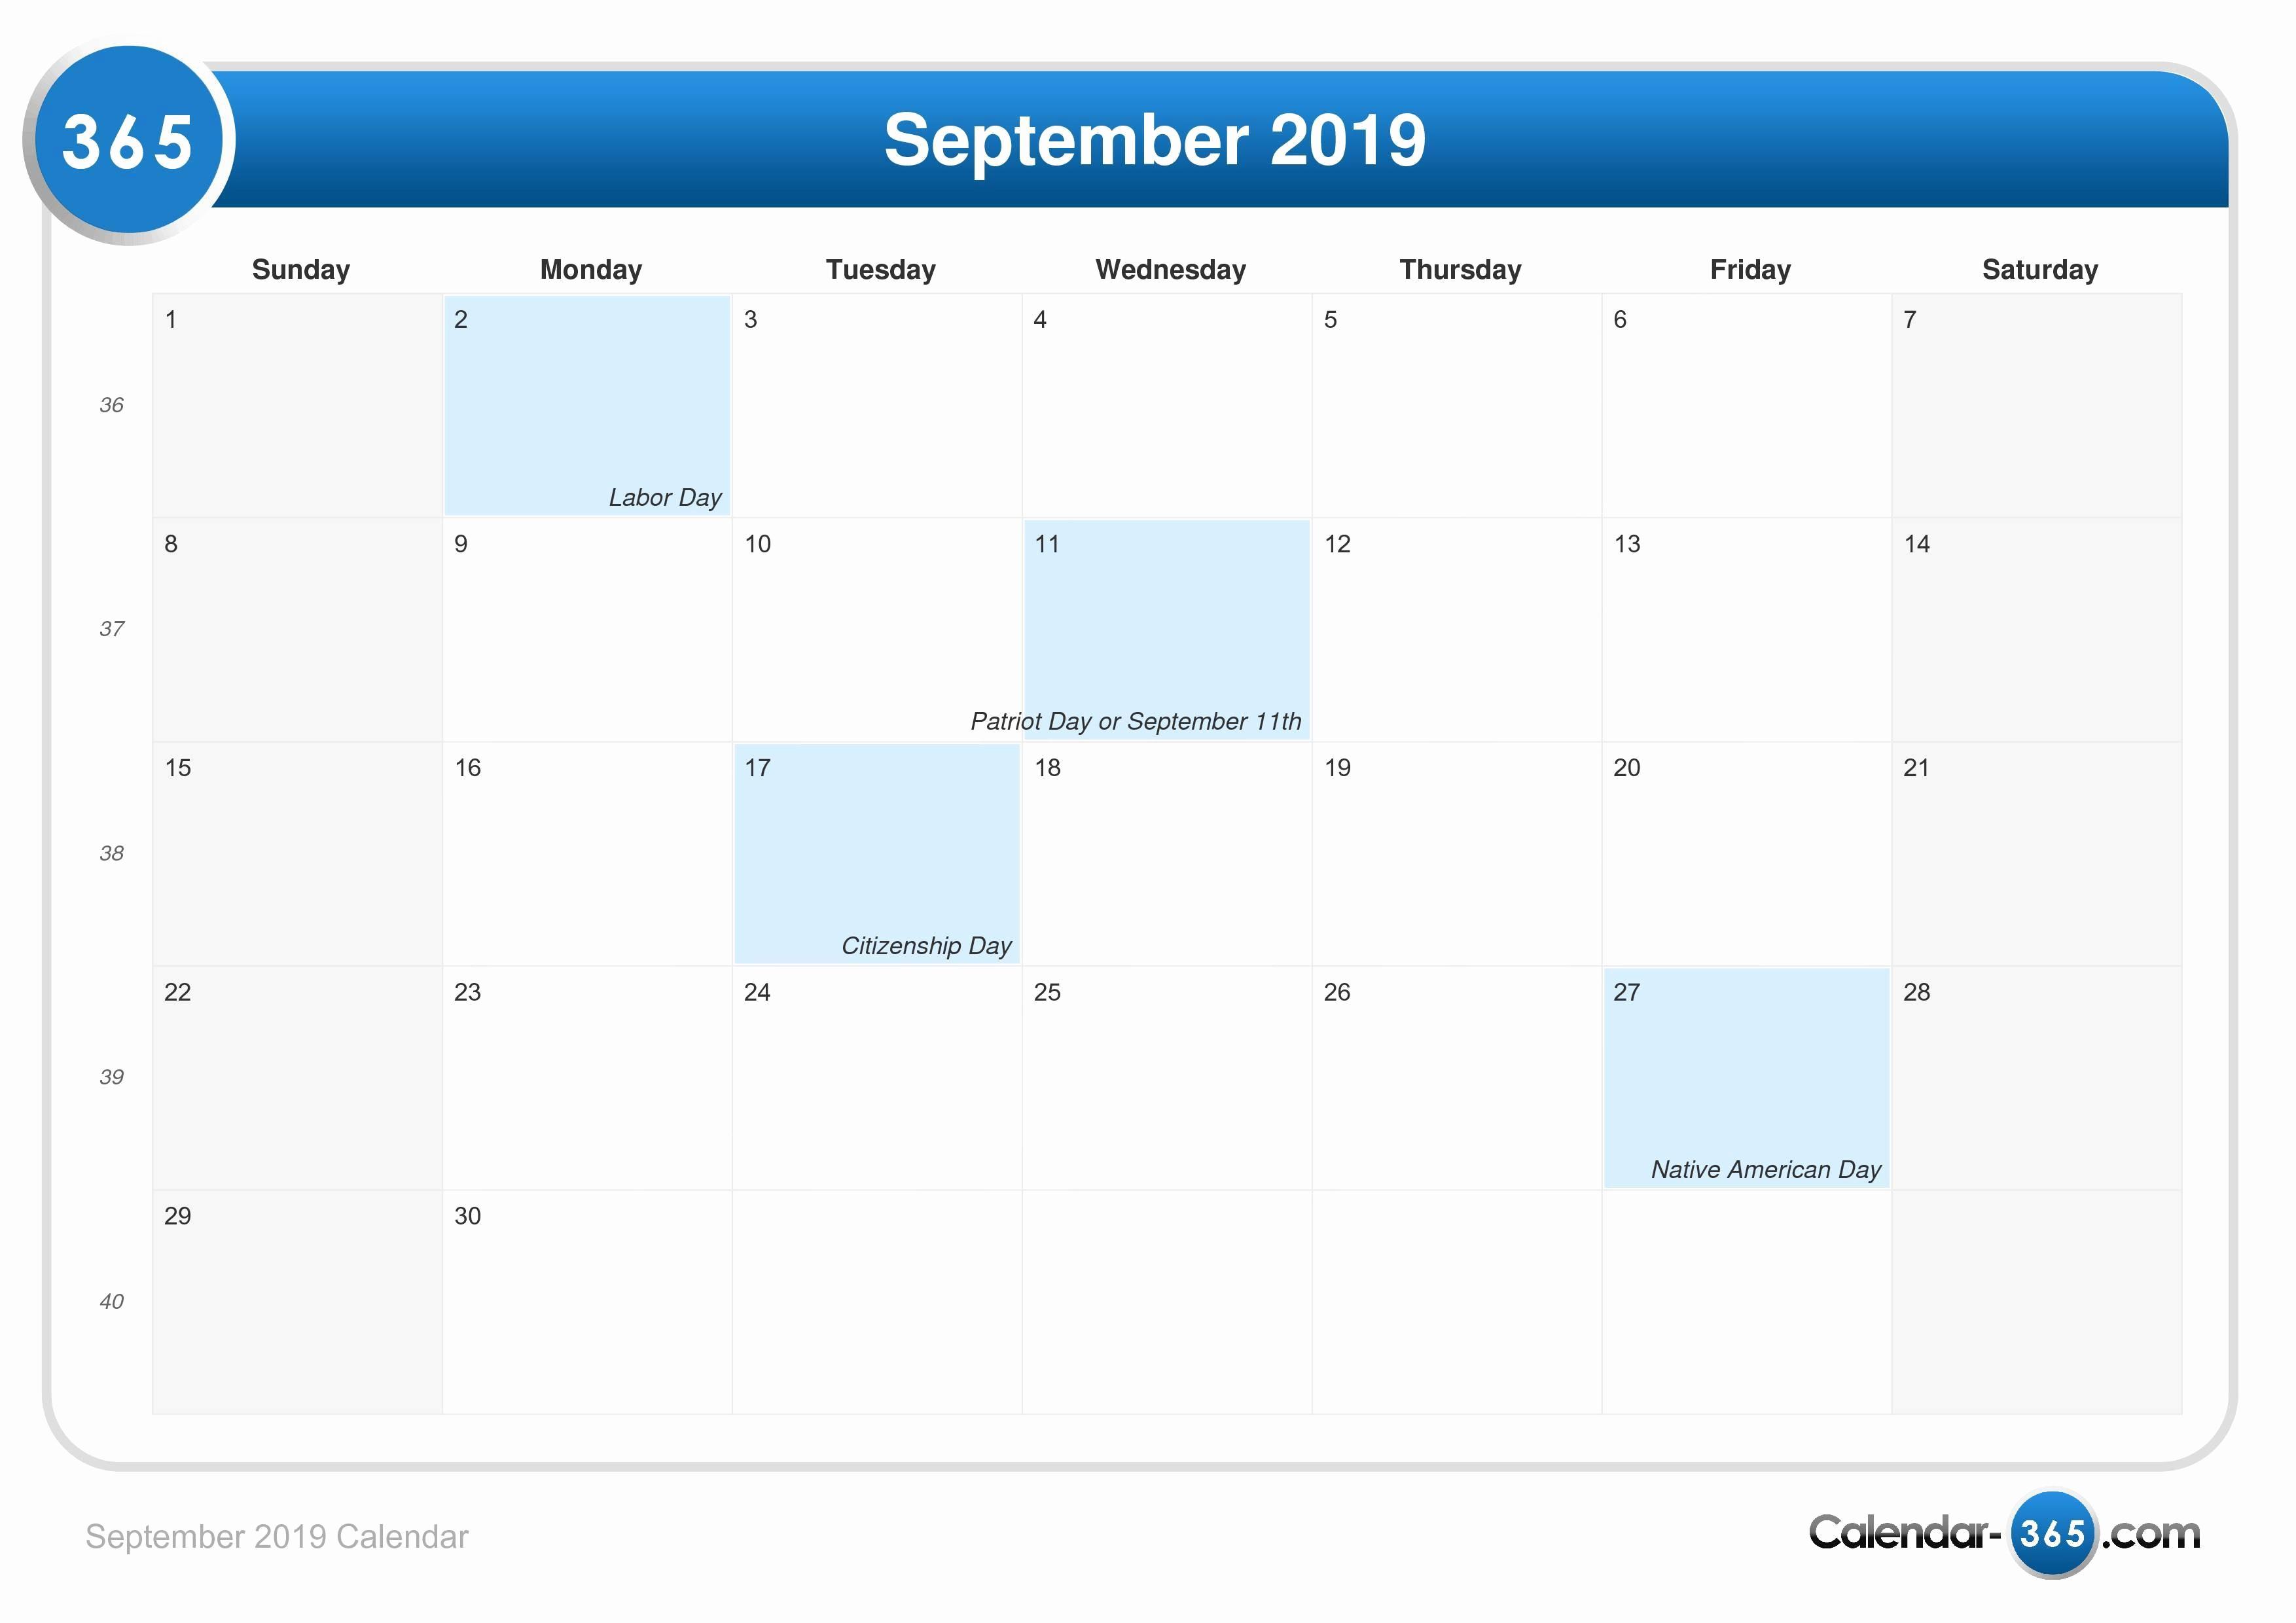 Mahalaxmi Calendar 2019 Marathi Download Actual Mahalaxmi Calendar 2019 September Of Mahalaxmi Calendar 2019 Marathi Download Más Recientes Calendar September Hindi 2018